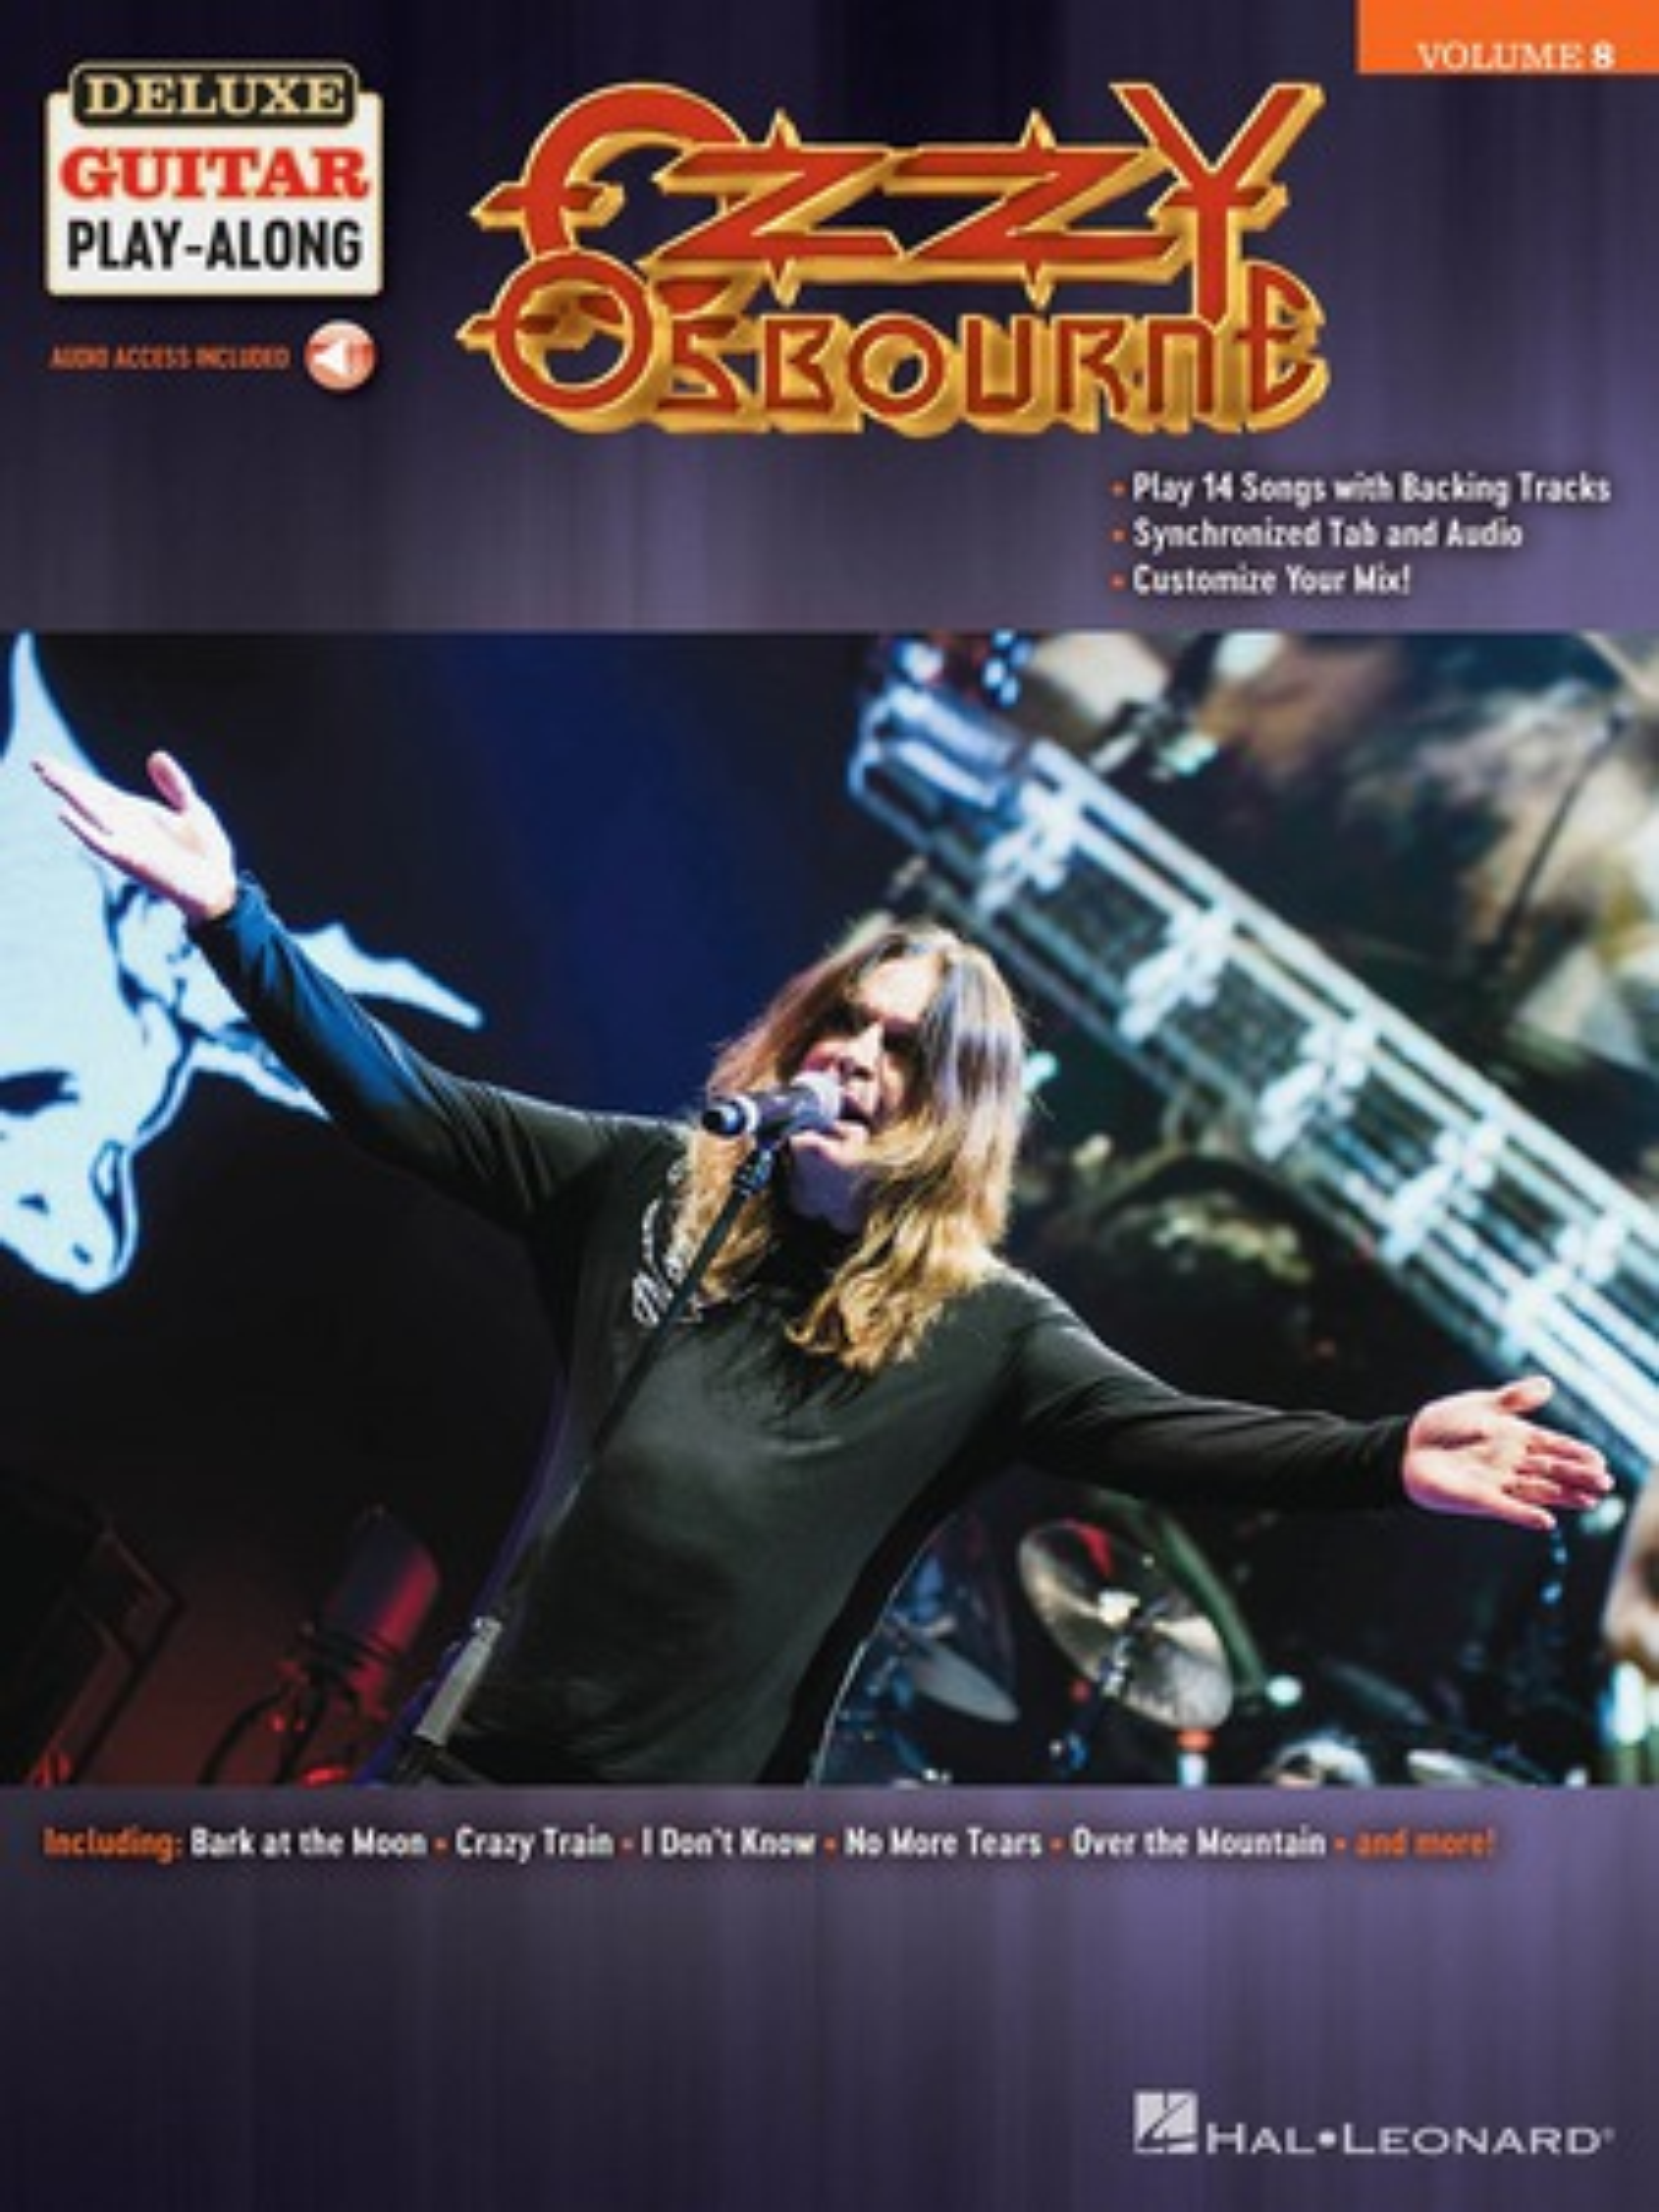 Deluxe Guitar Play-Along, Vol. 8: Ozzy Osbourne